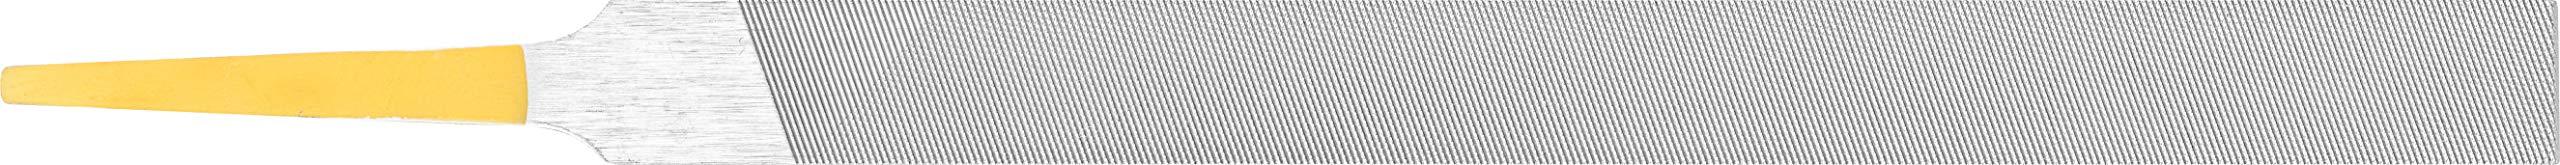 PFERD Machinist Hand File, Swiss Pattern, Double Cut, Rectangular, #0 Coarseness, 6'' Length, 1/2'' Width, 5/32'' Thickness